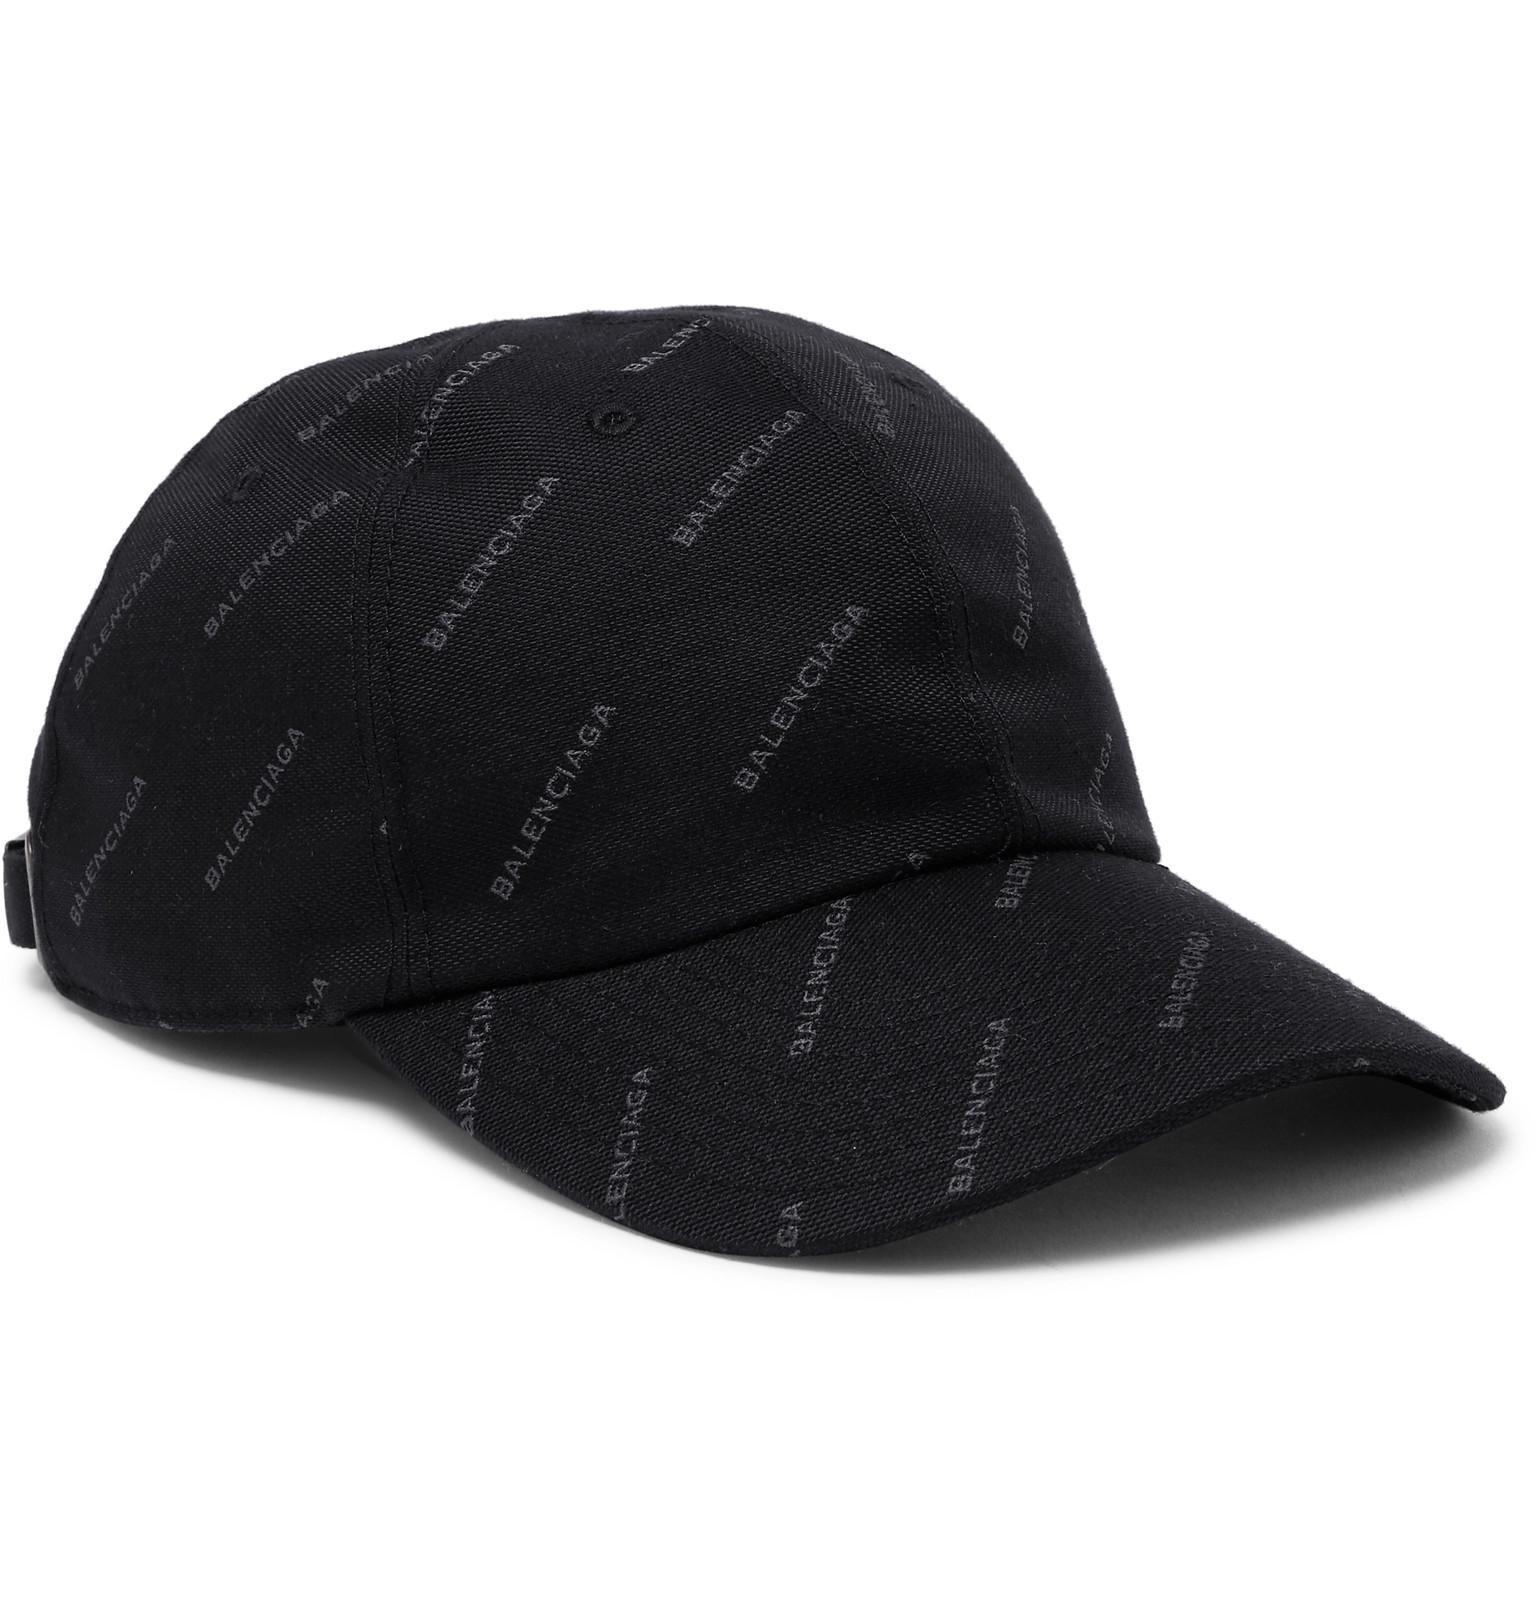 1079ee13 Balenciaga Printed Twill Baseball Cap in Black for Men - Lyst